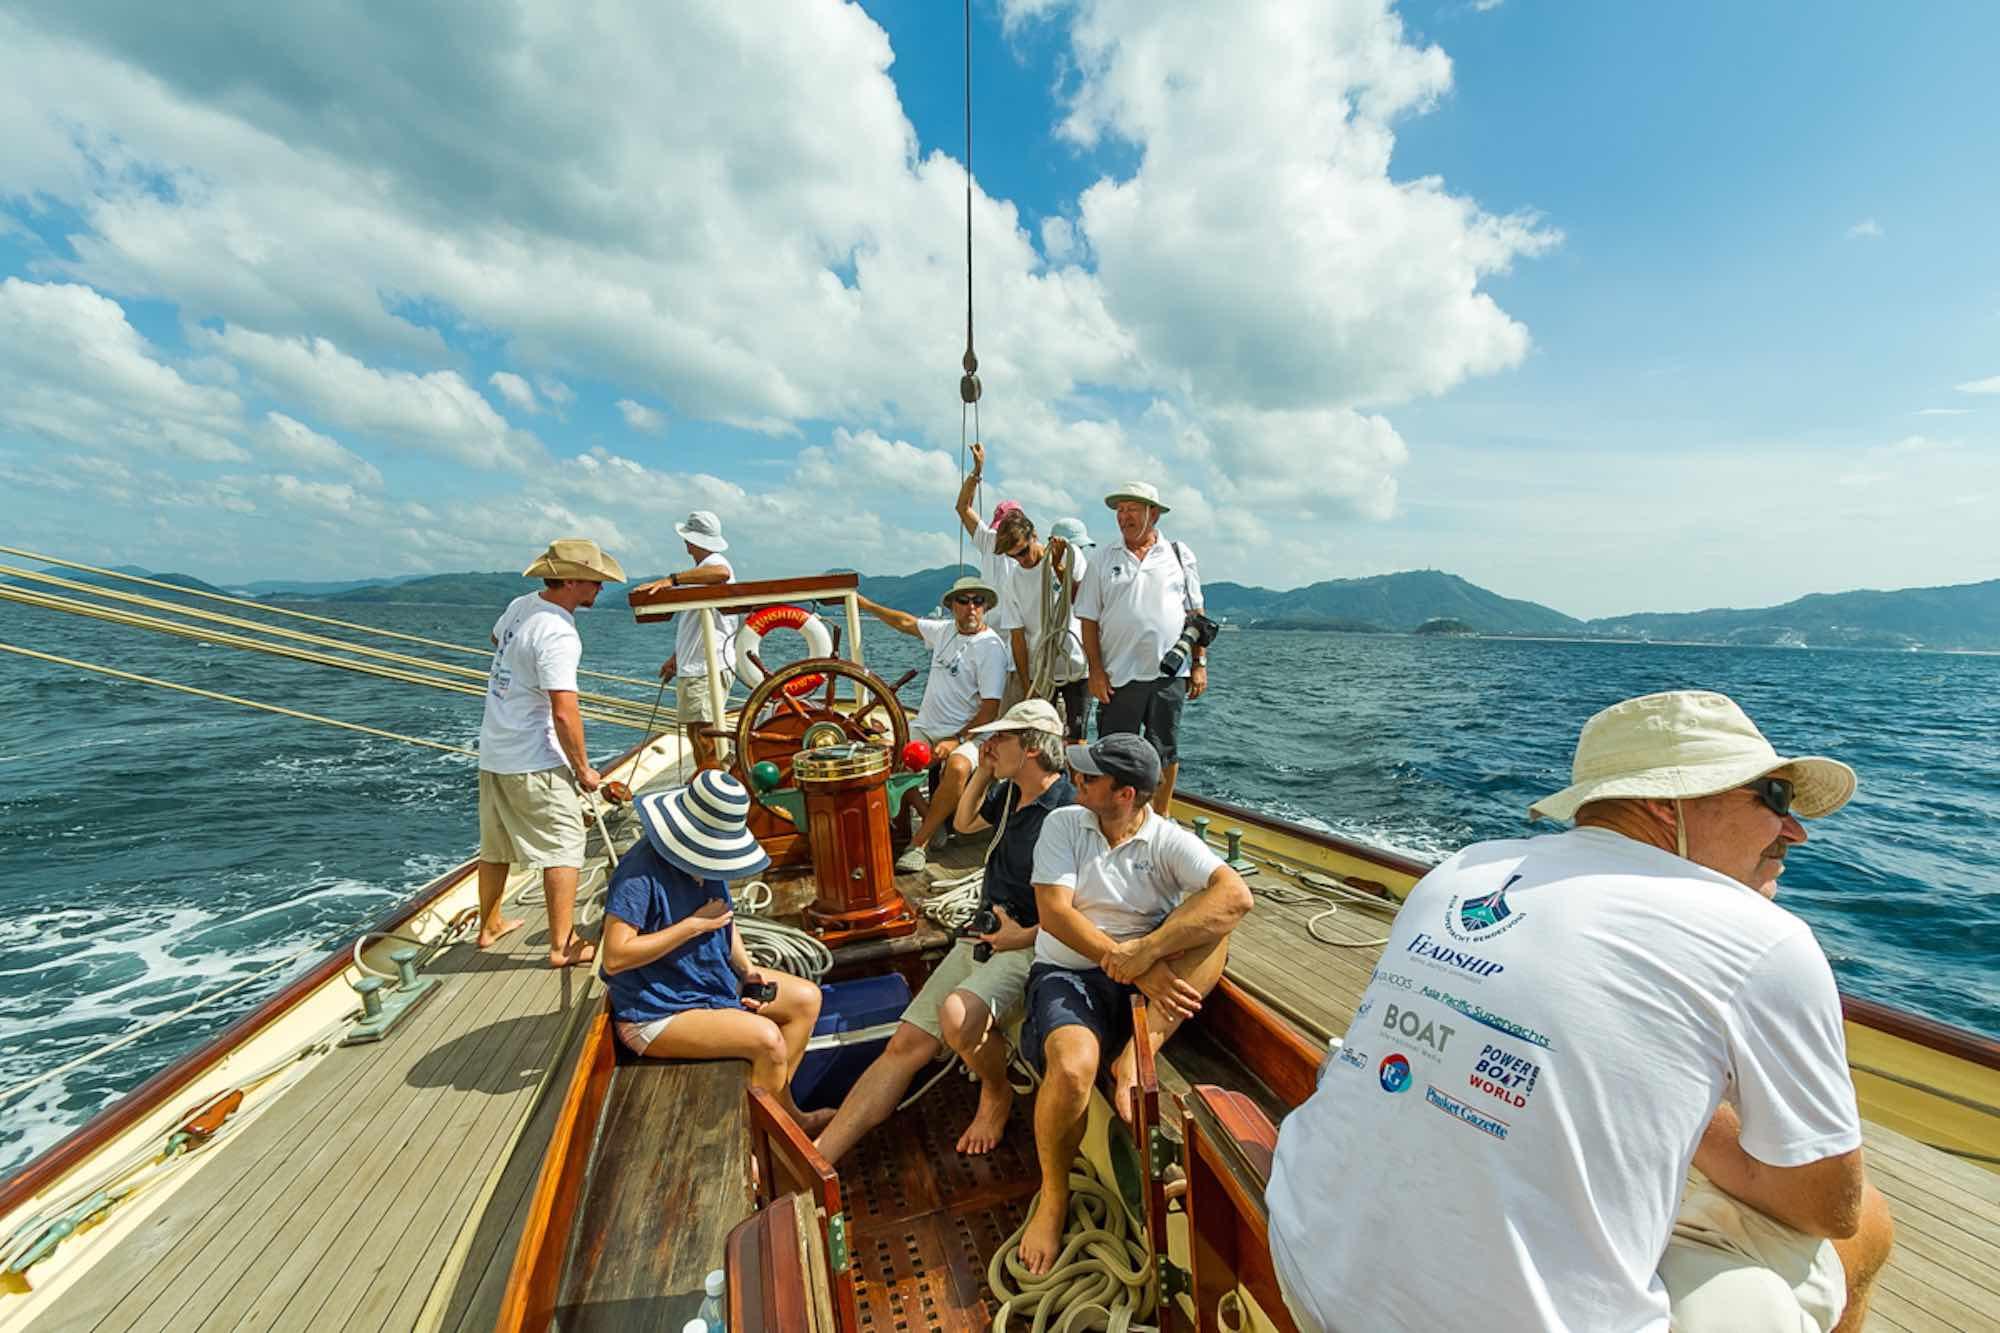 asia superyacht rendezvous 2014 sunshine (13).jpeg